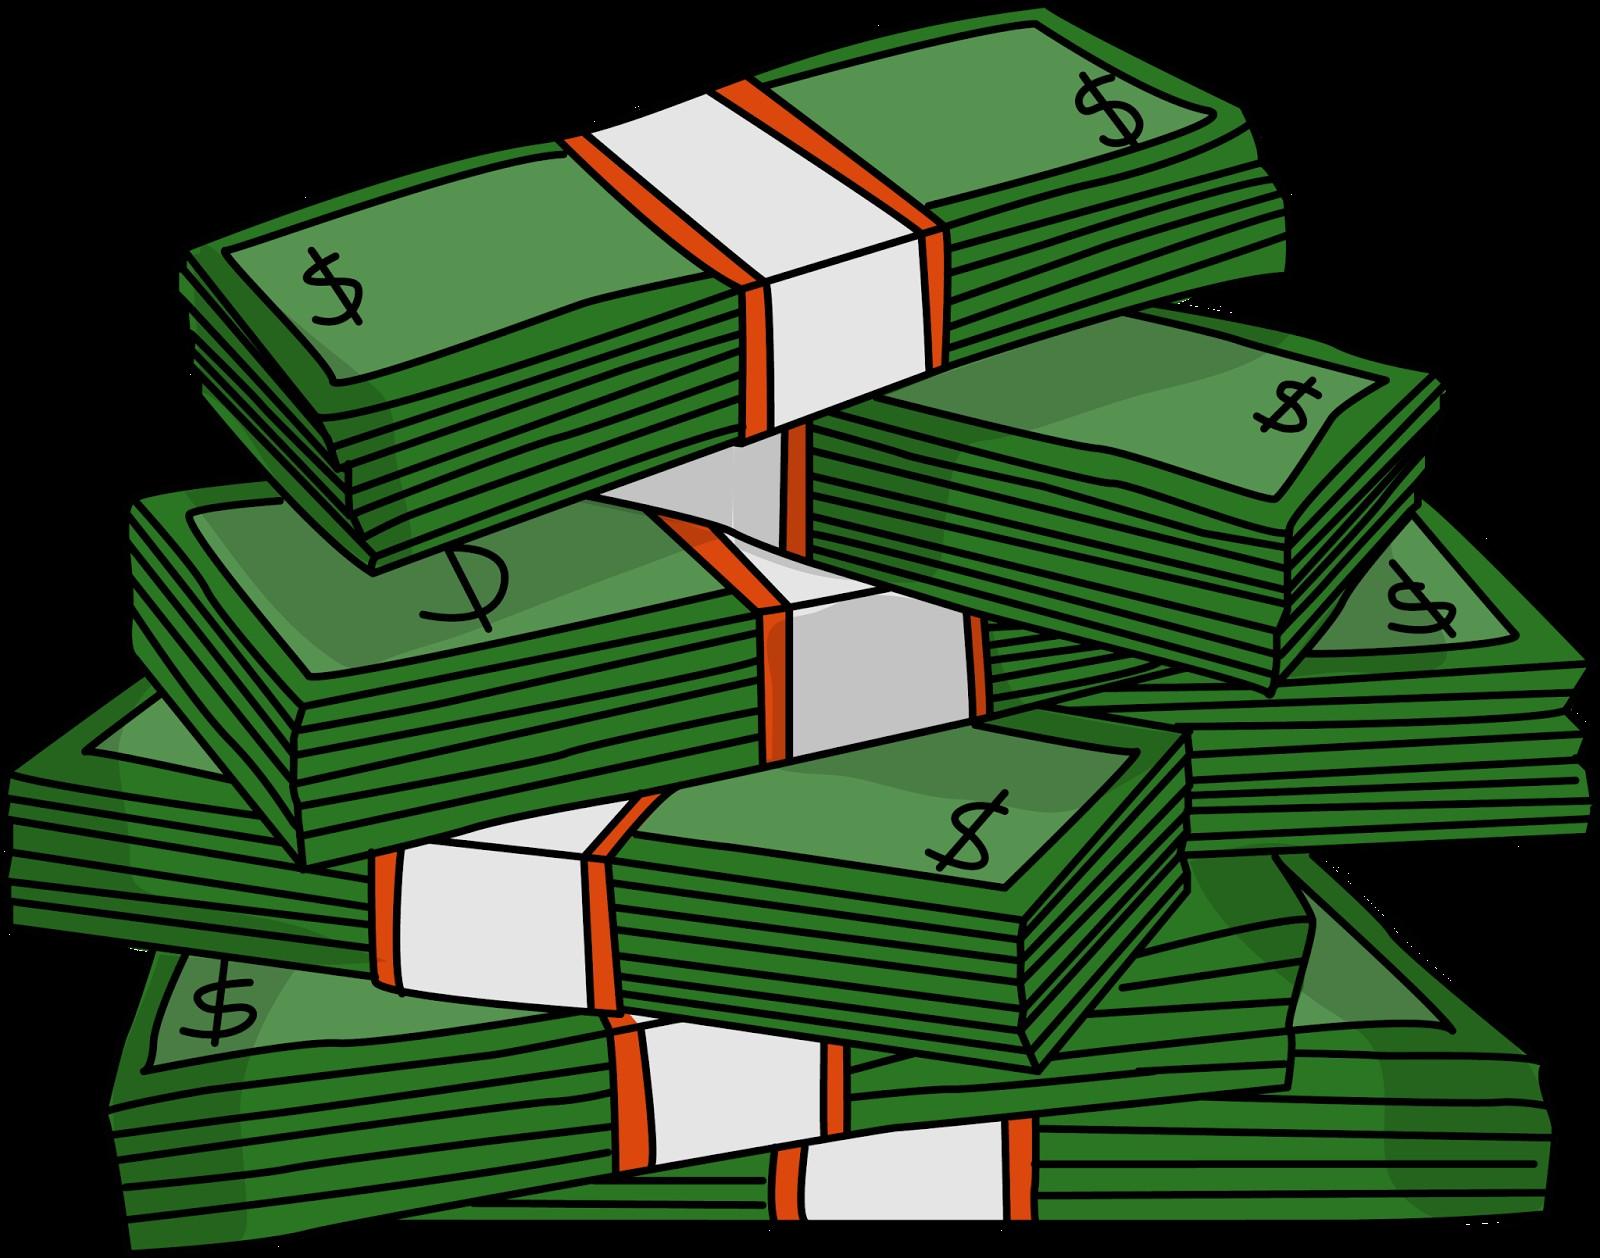 Cash clipart. Clip art transparent png